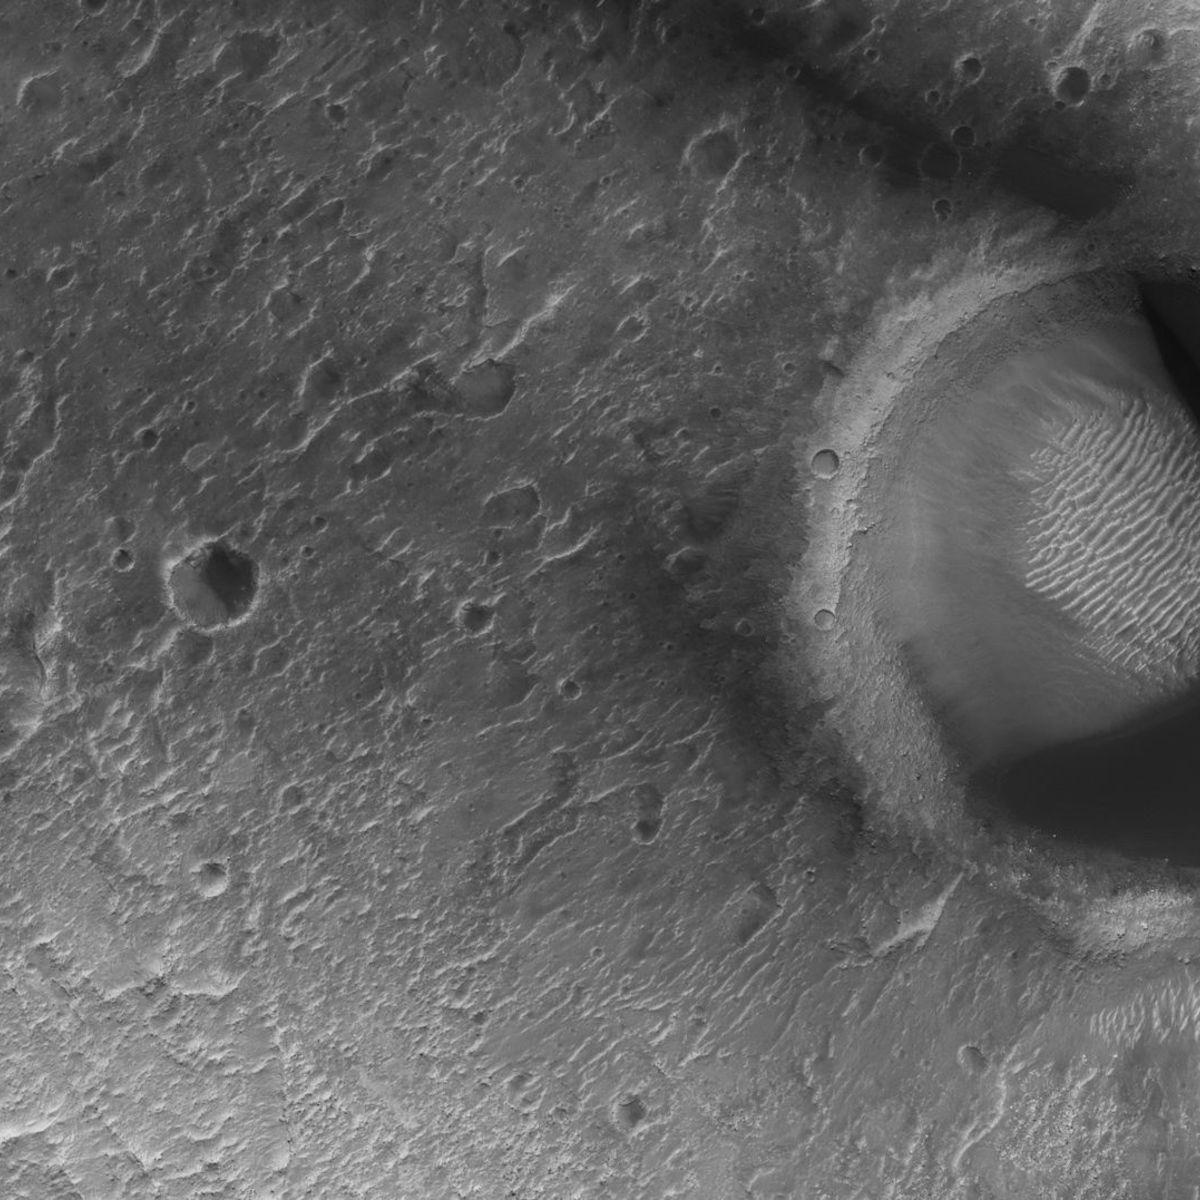 hirise_paA sand-filled dune on Mars looks more than a little bit like Pac-Man. Credit: NASA/JPL/University of Arizonacmandune_hero